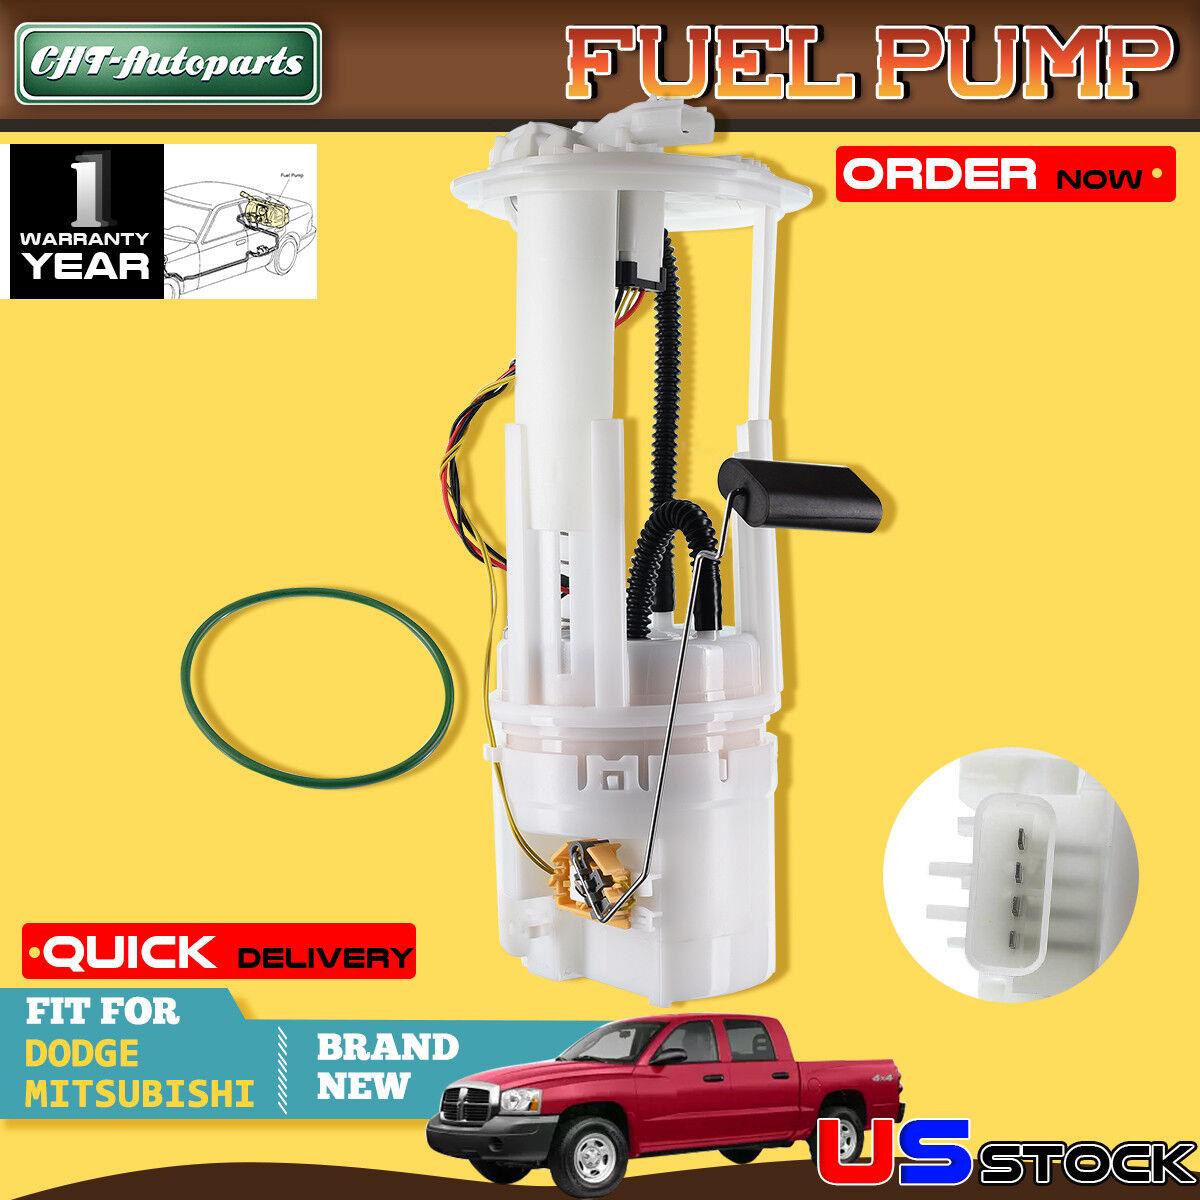 New Fuel Pump Assembly for 2005-2009 Dodge Dakota Mitsubishi Raider GAM925